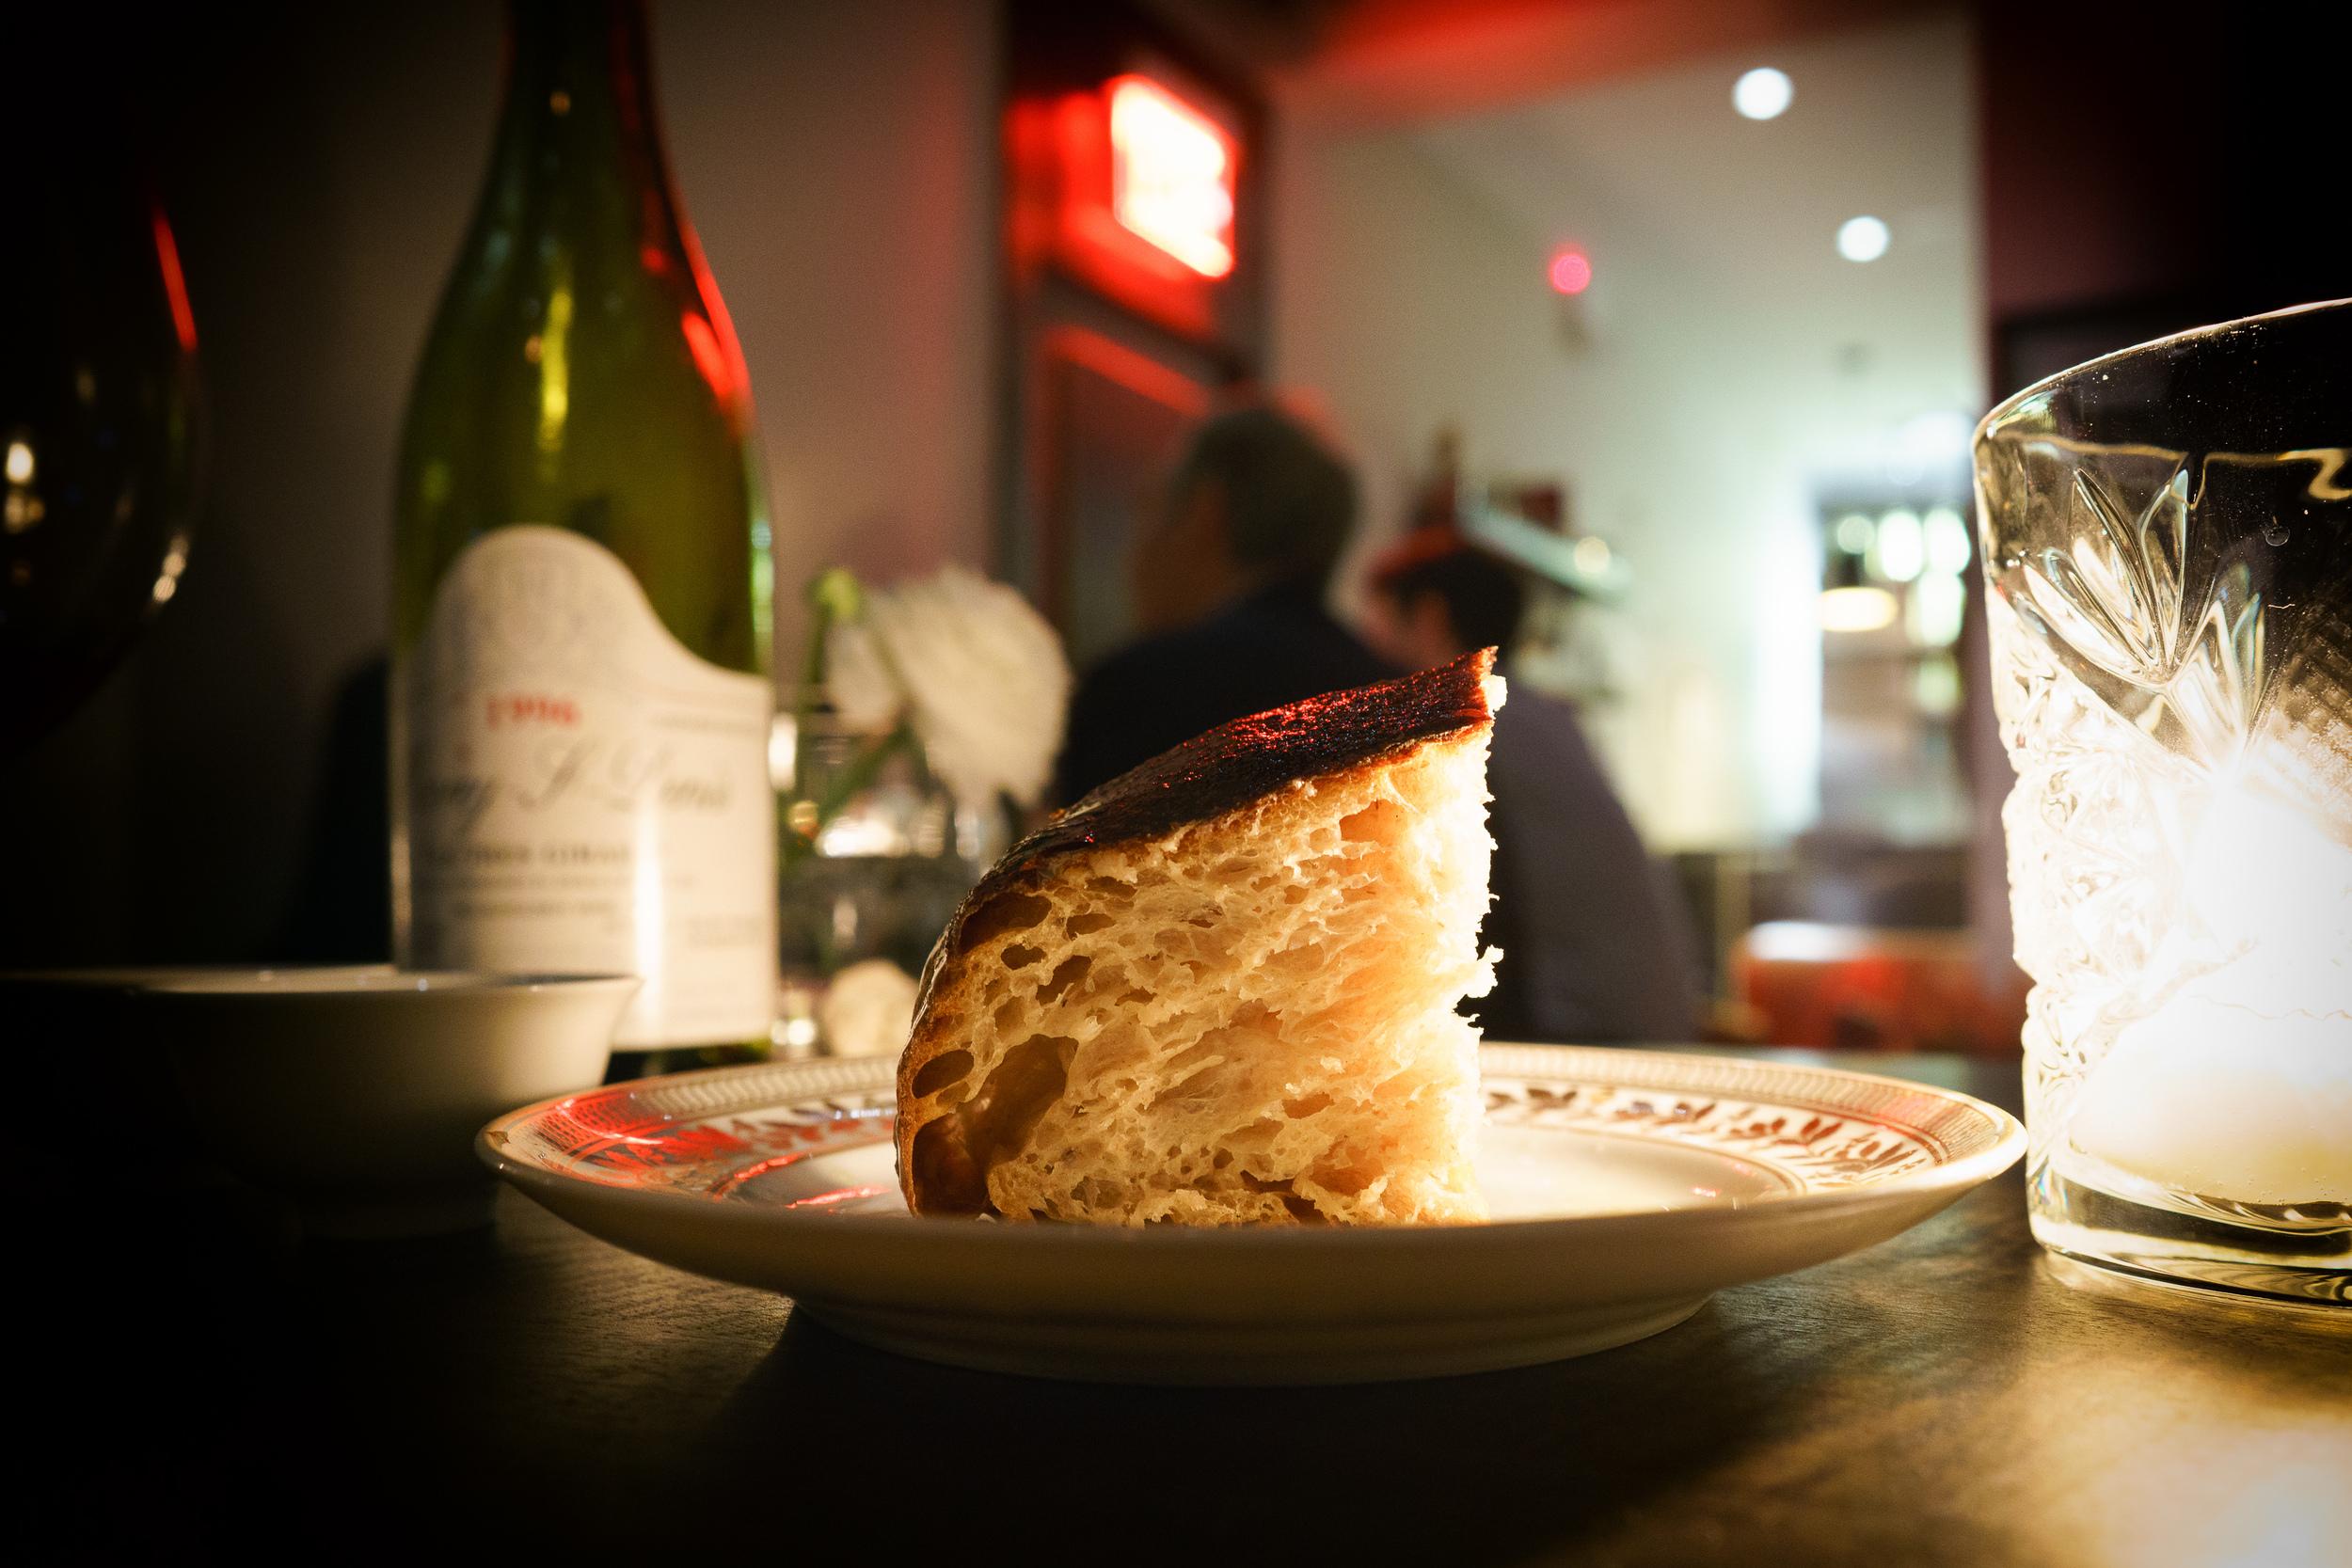 Chef Ribeiro's House-baked Sourdough